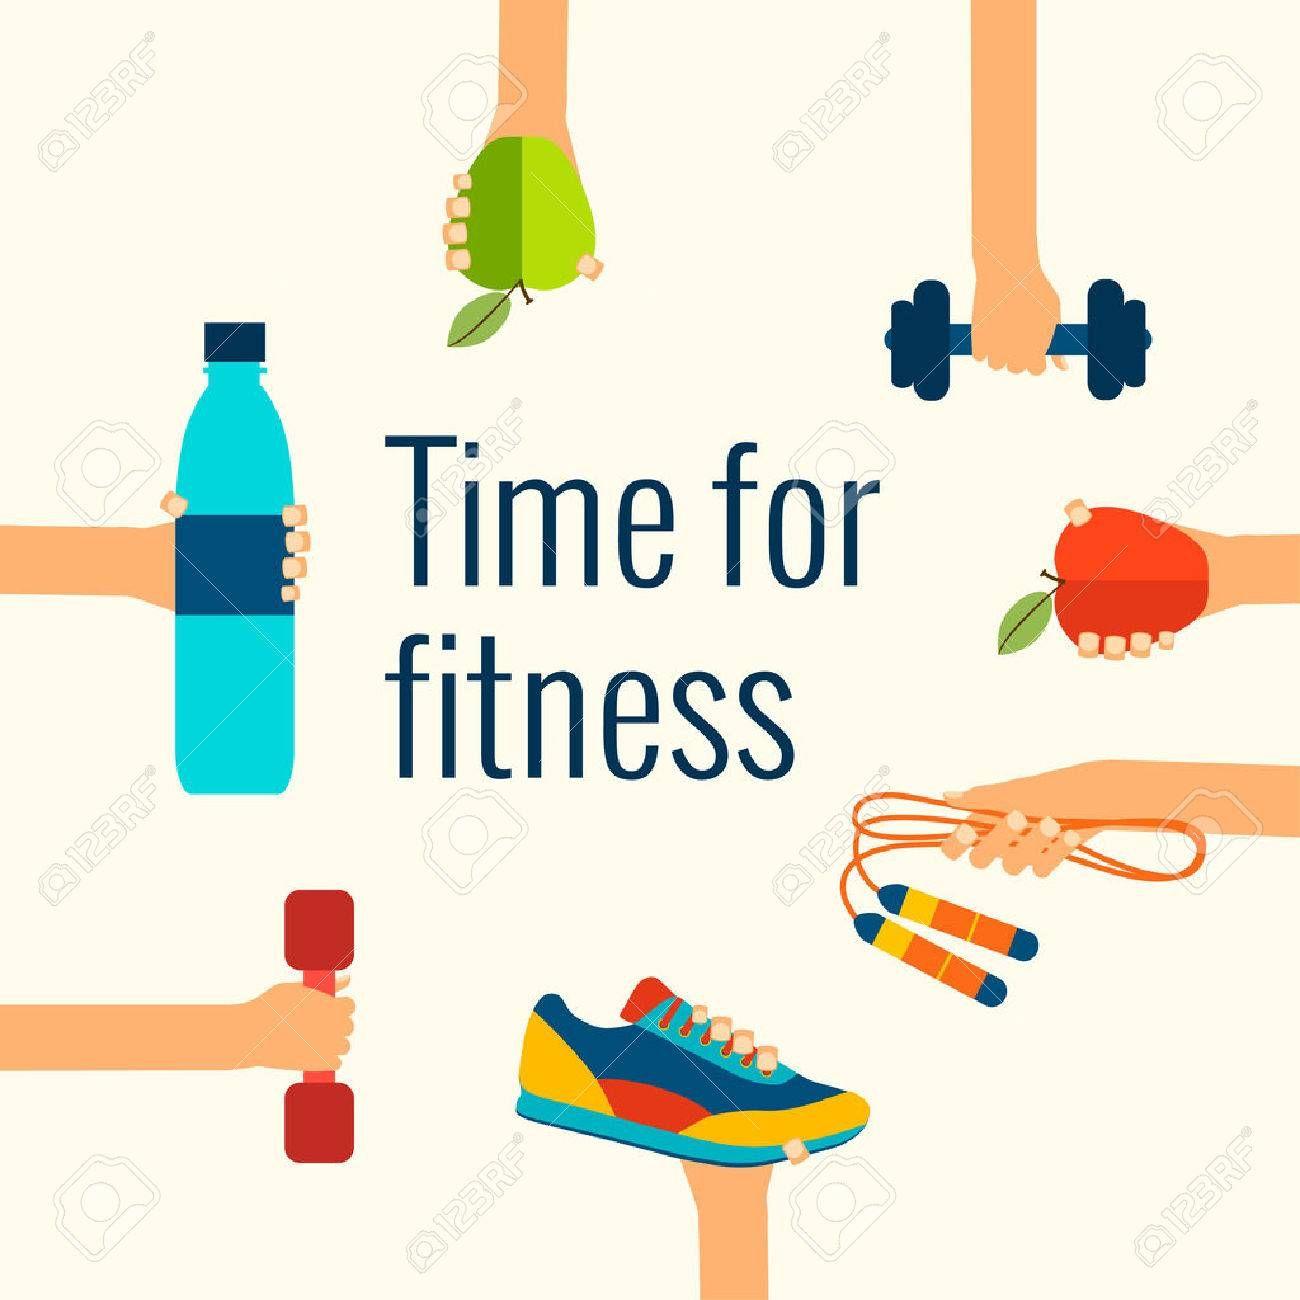 Image result for free clipart senior exercise | Free clip art, Senior  fitness, Clip art